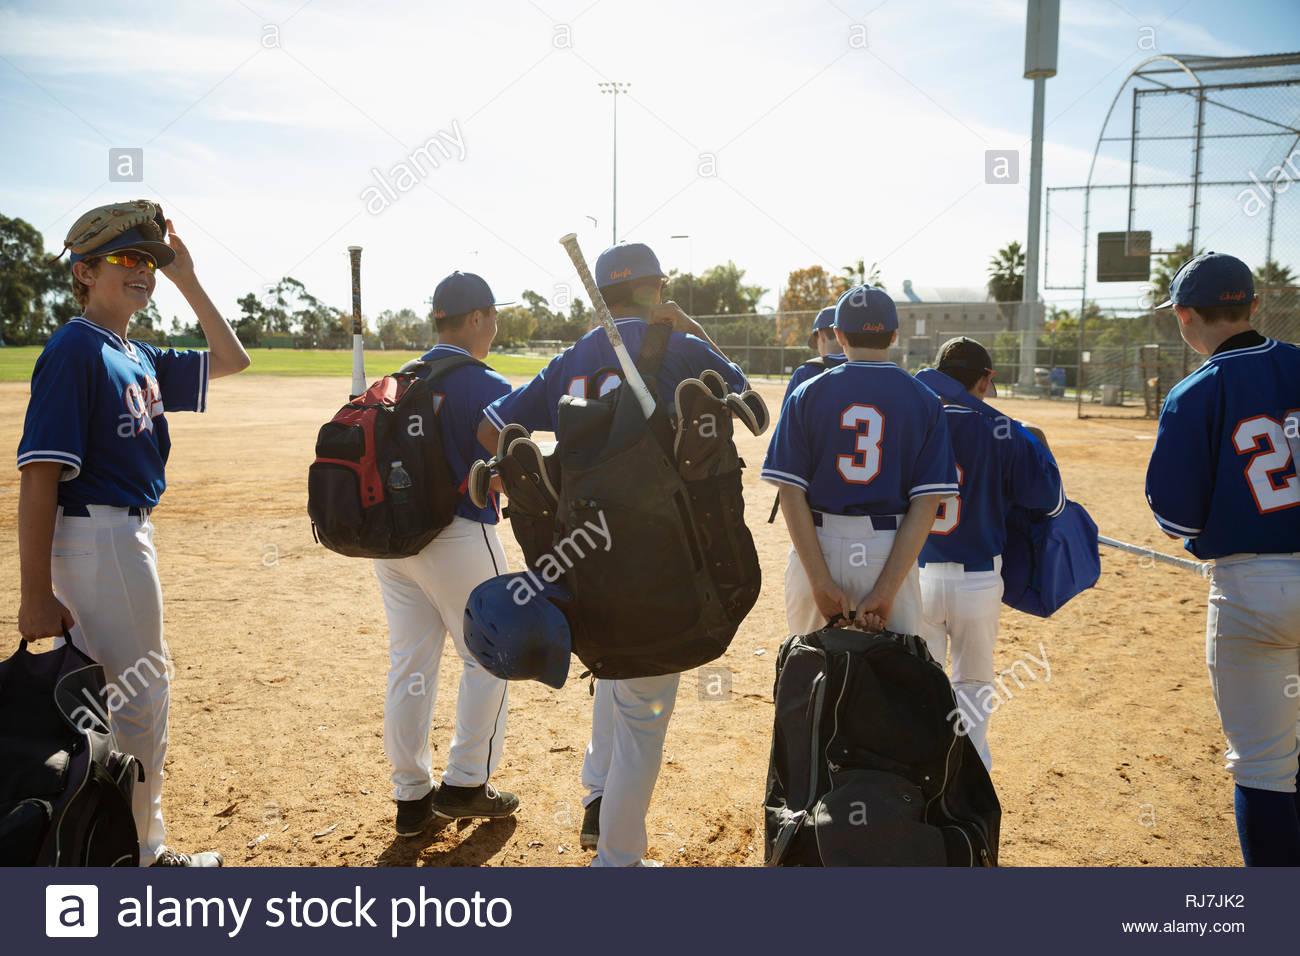 Baseball spieler Equipment tragen an sonnigen Feld Stockbild